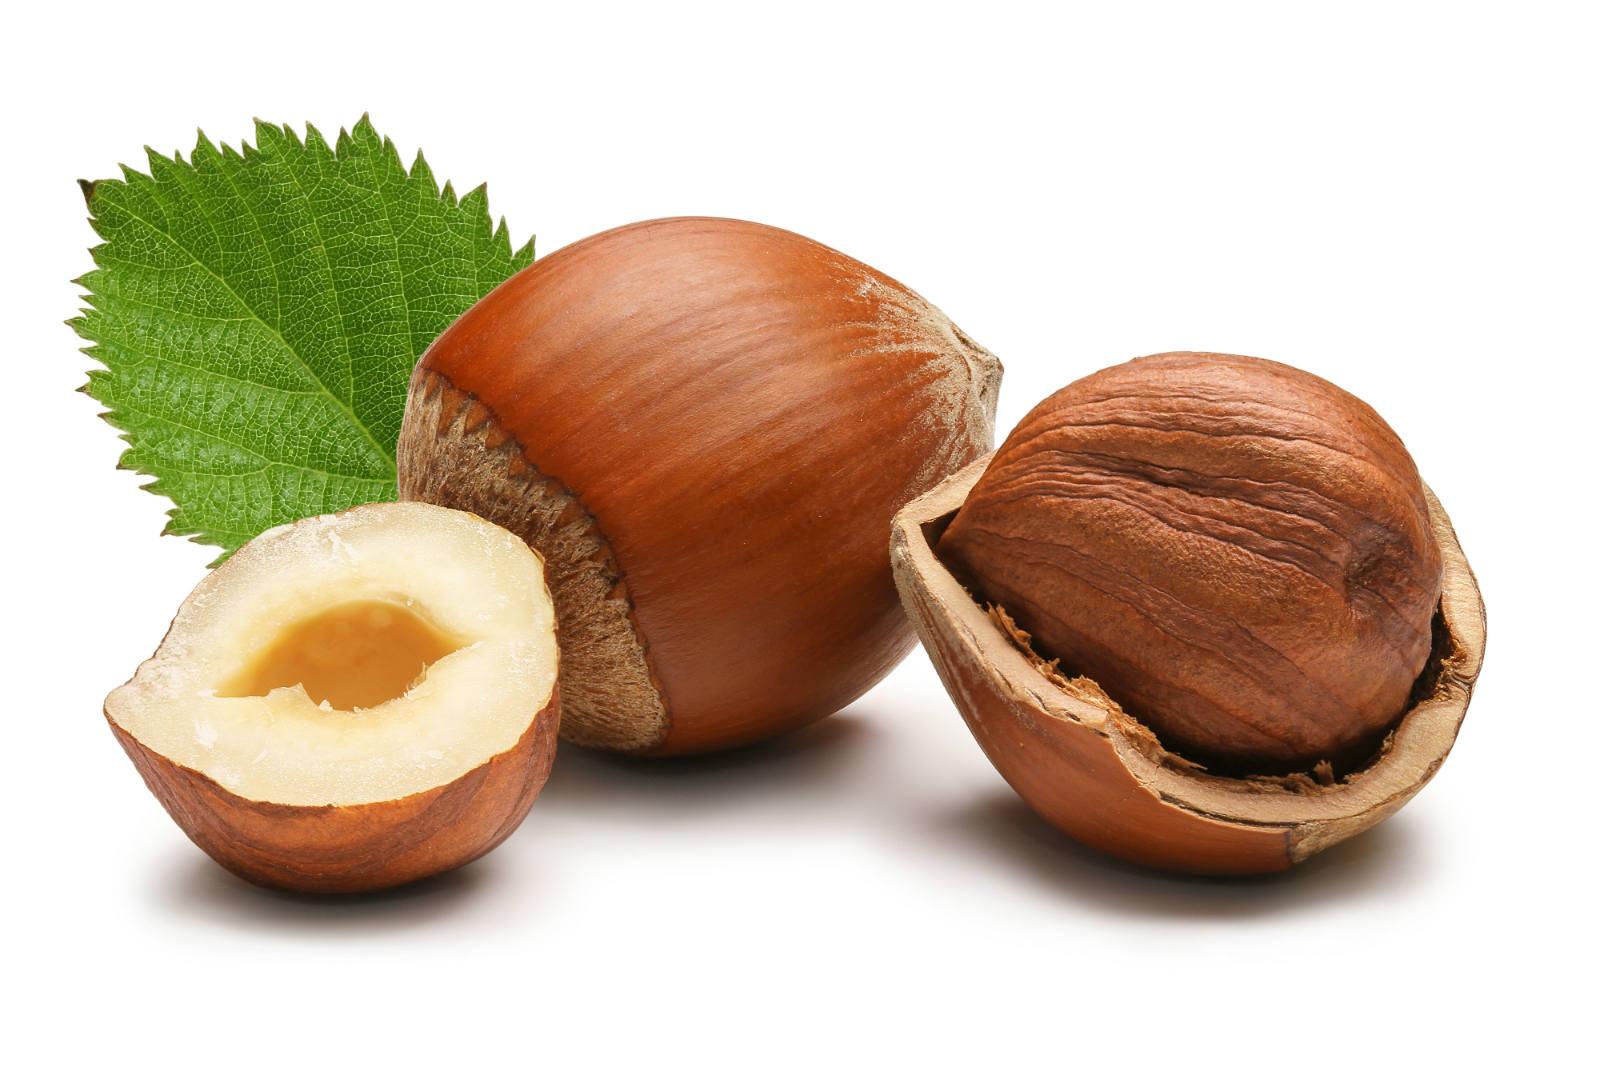 upotreba lesnikovog ulja za zdravlje